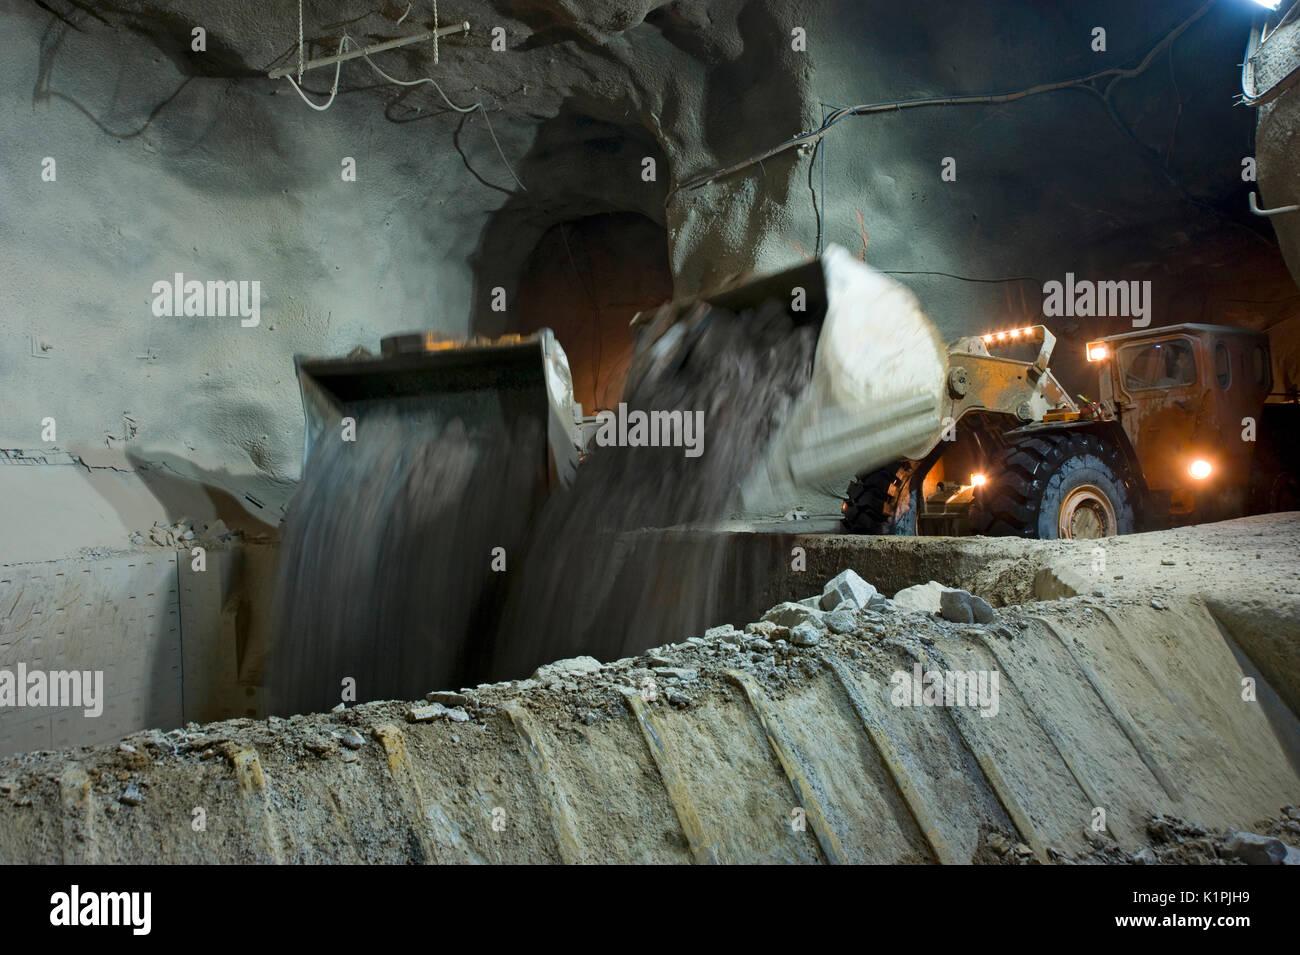 mine loaders under ground - Stock Image